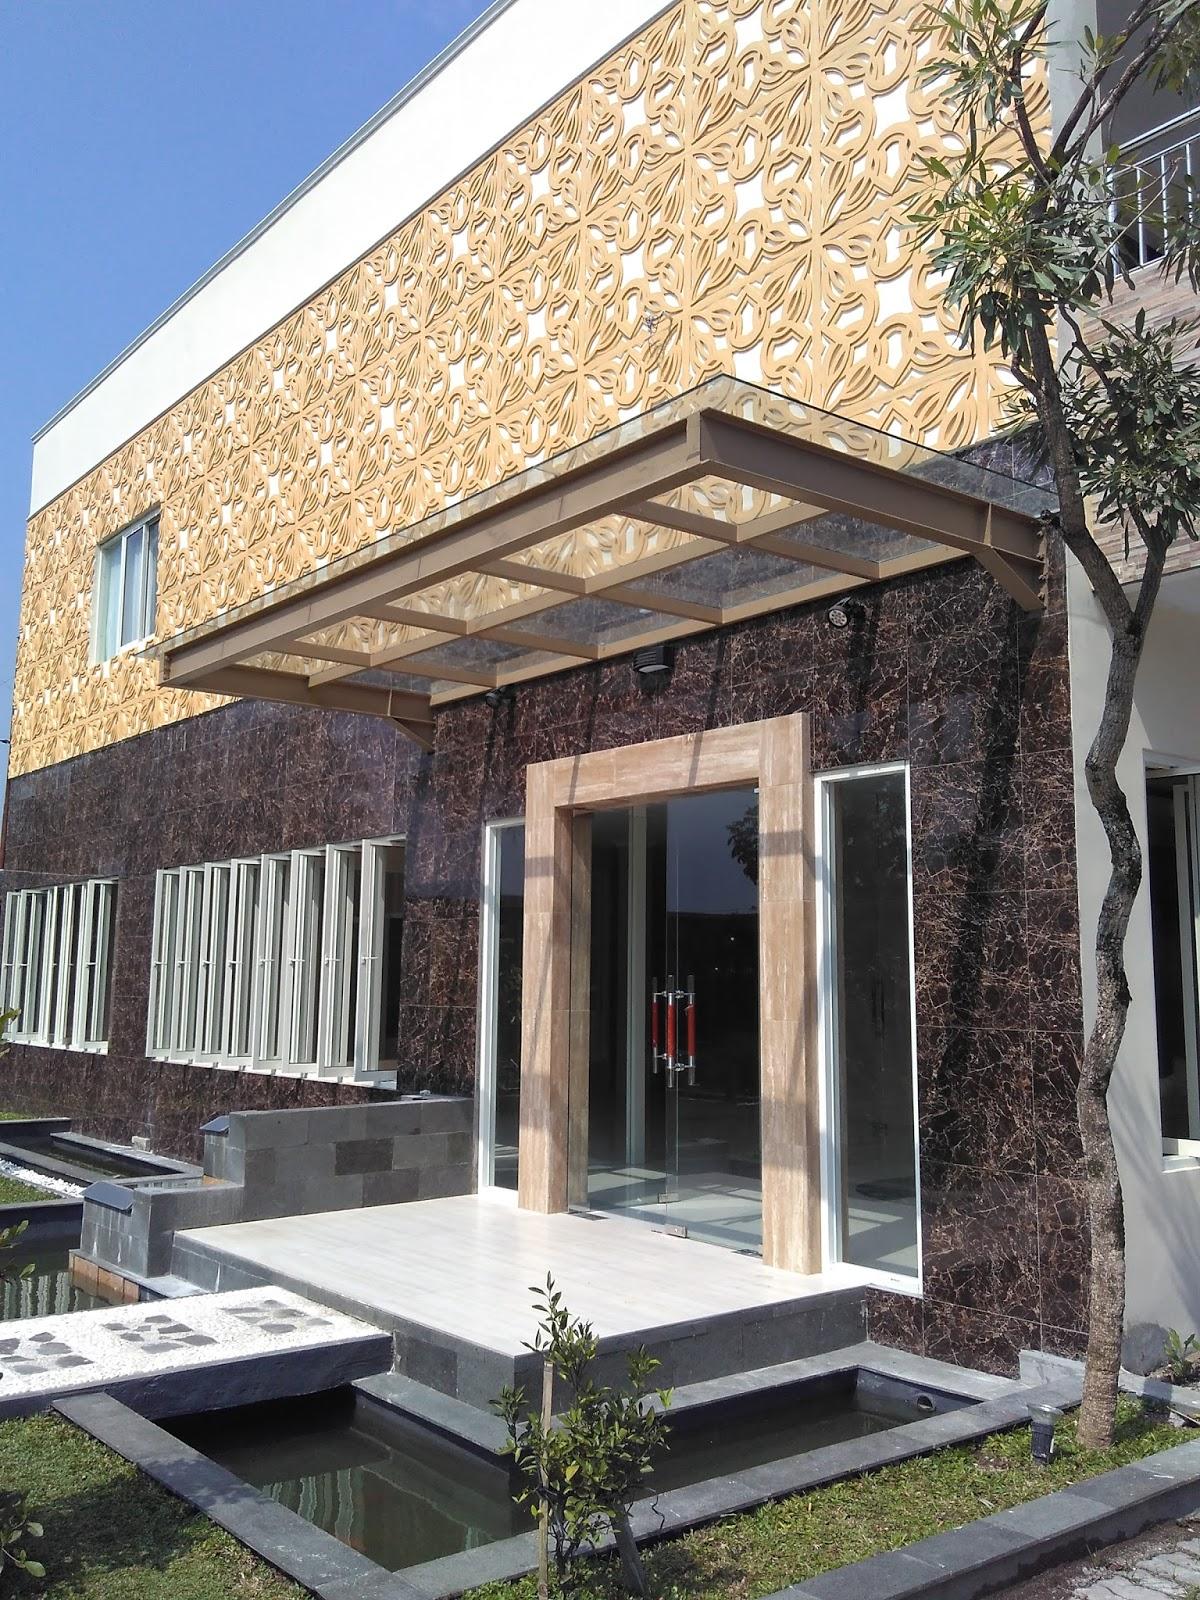 kanopi baja ringan yogyakarta gambar melengkung | expo desain rumah